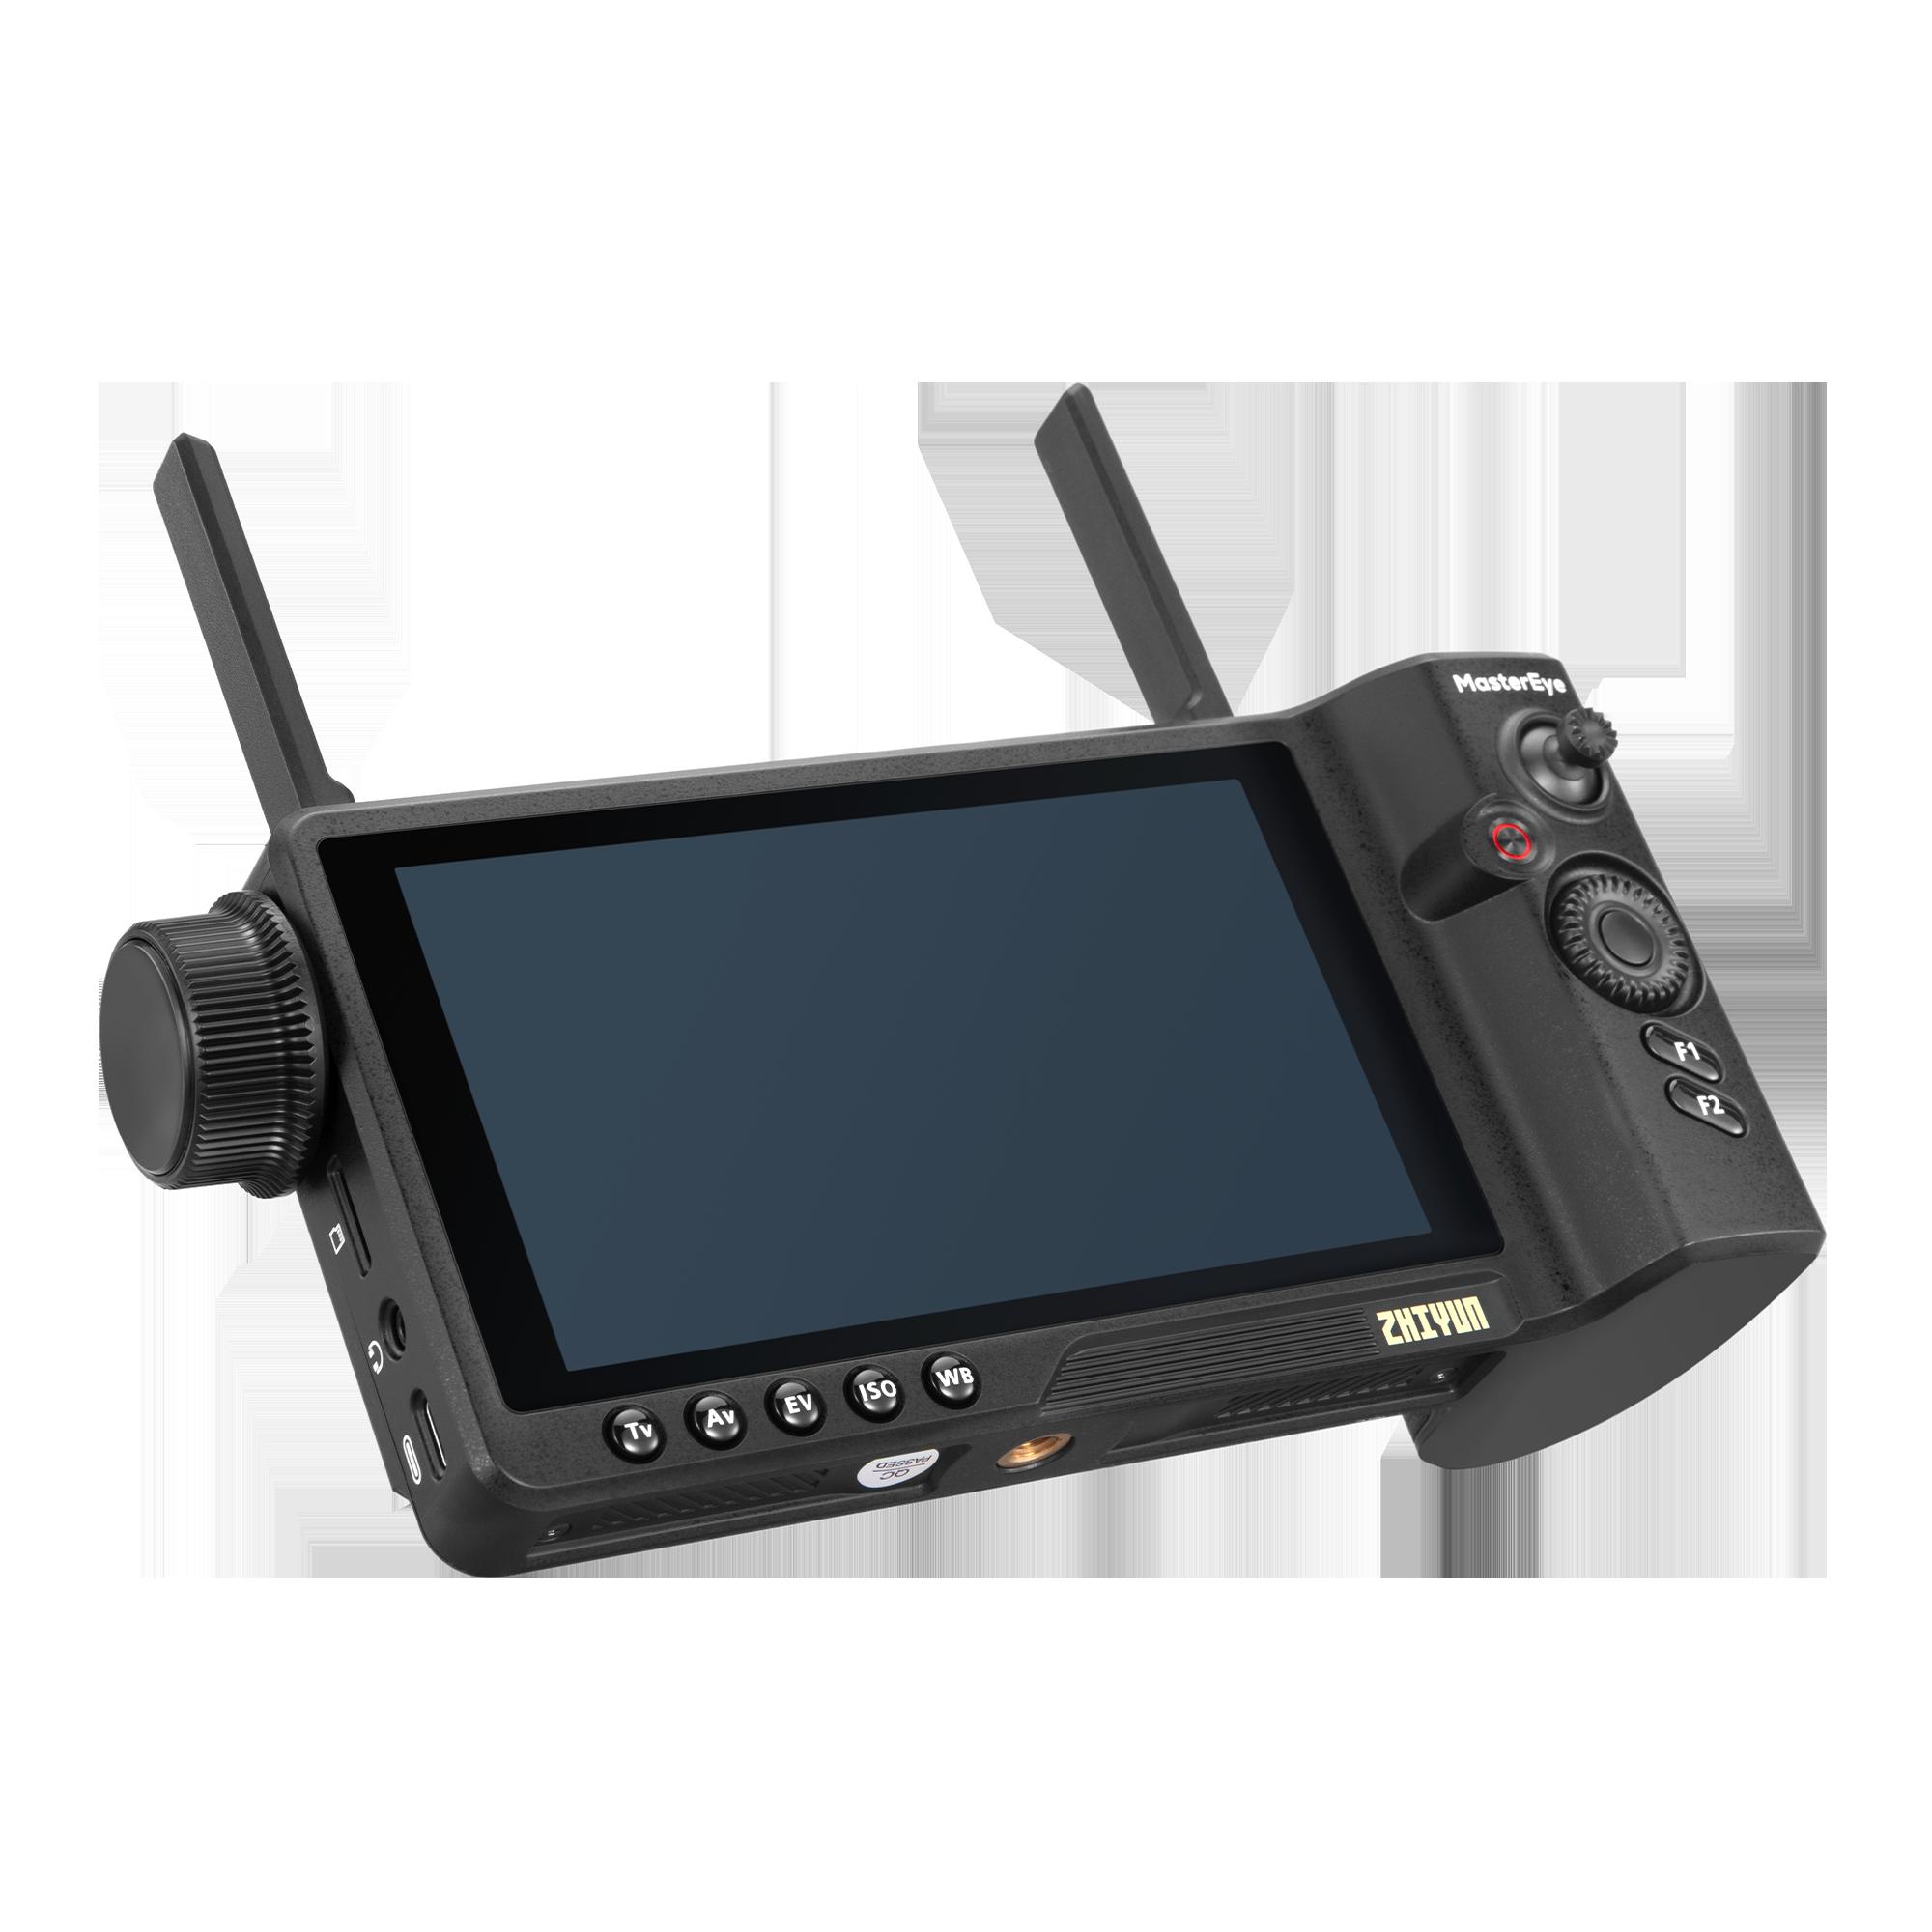 Zhiyun MasterEye البصرية تحكم VC100 رصد استقبال ل weebell 2 S & رافعة 3S 2 S يده مثبت أفقي اكسسوارات